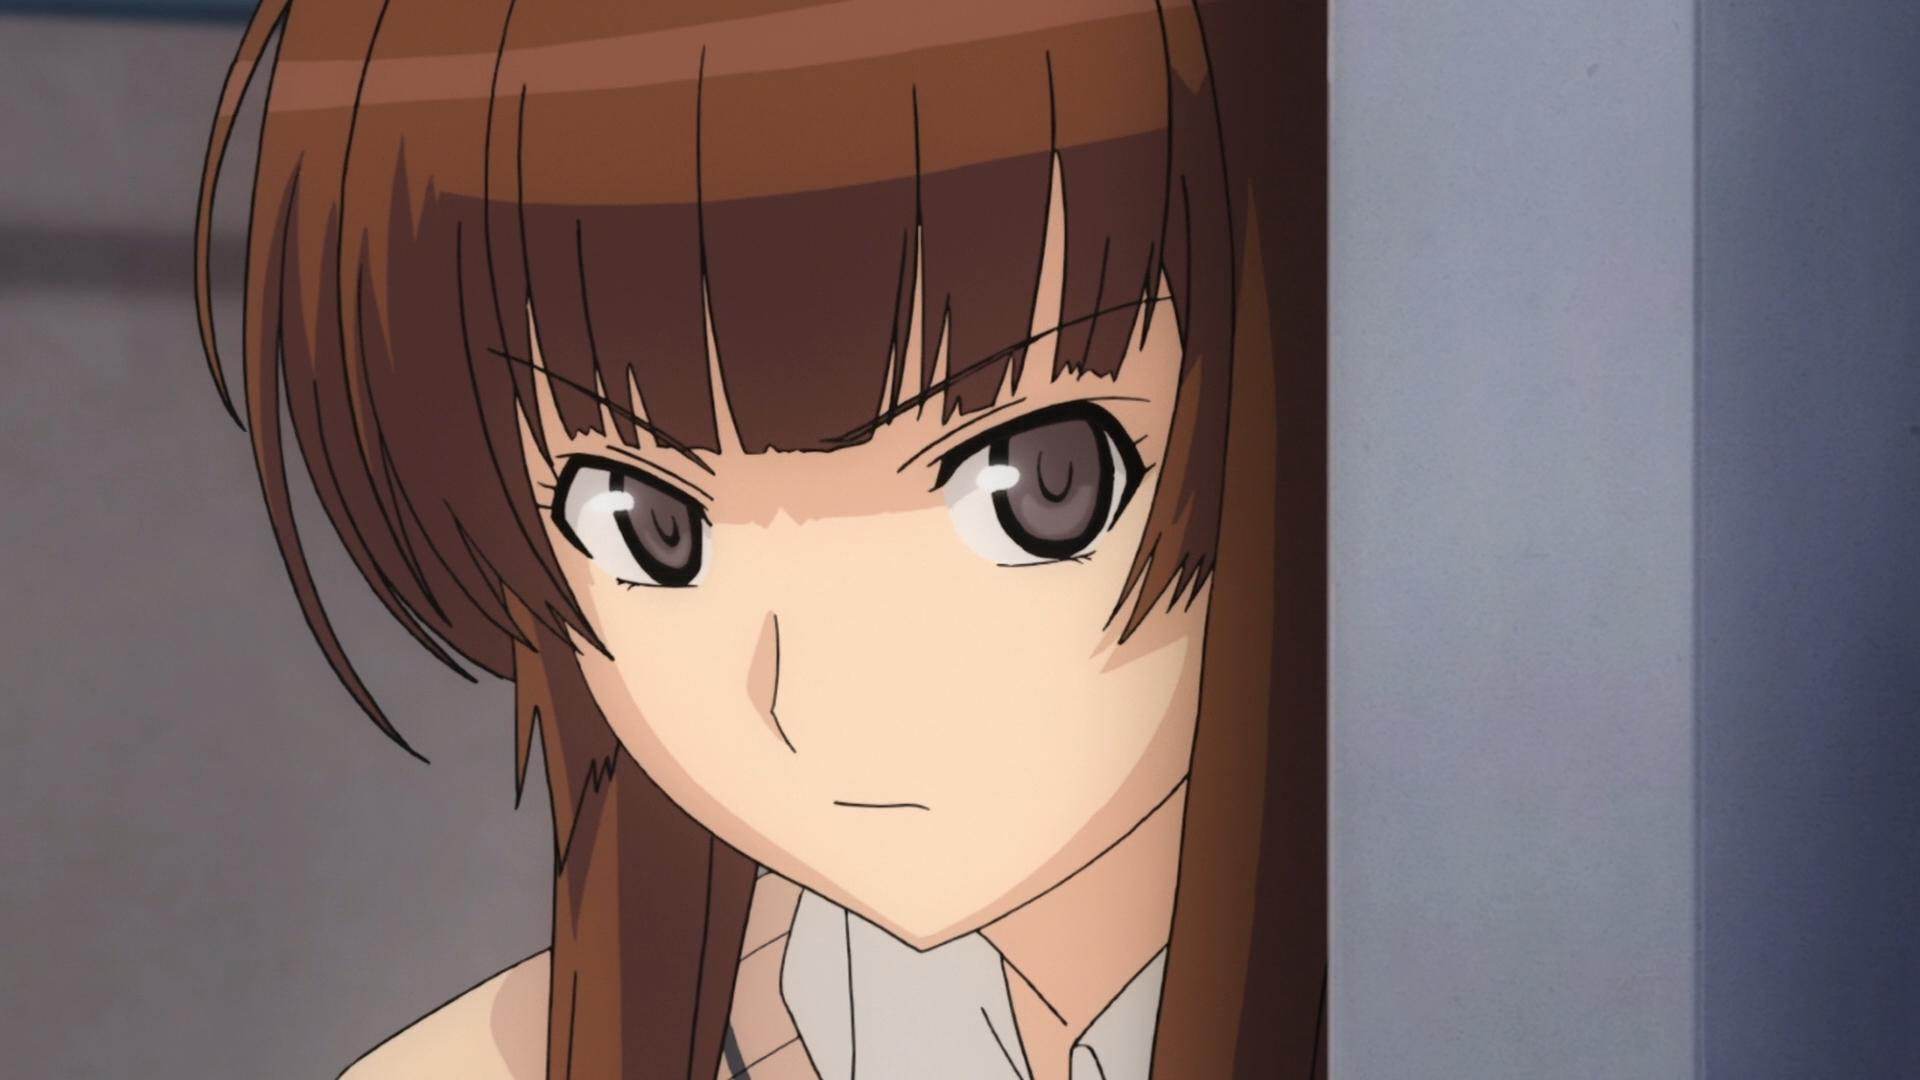 Risa Kamizaki making sure Junichi doesn't stray. (Amagami SS)